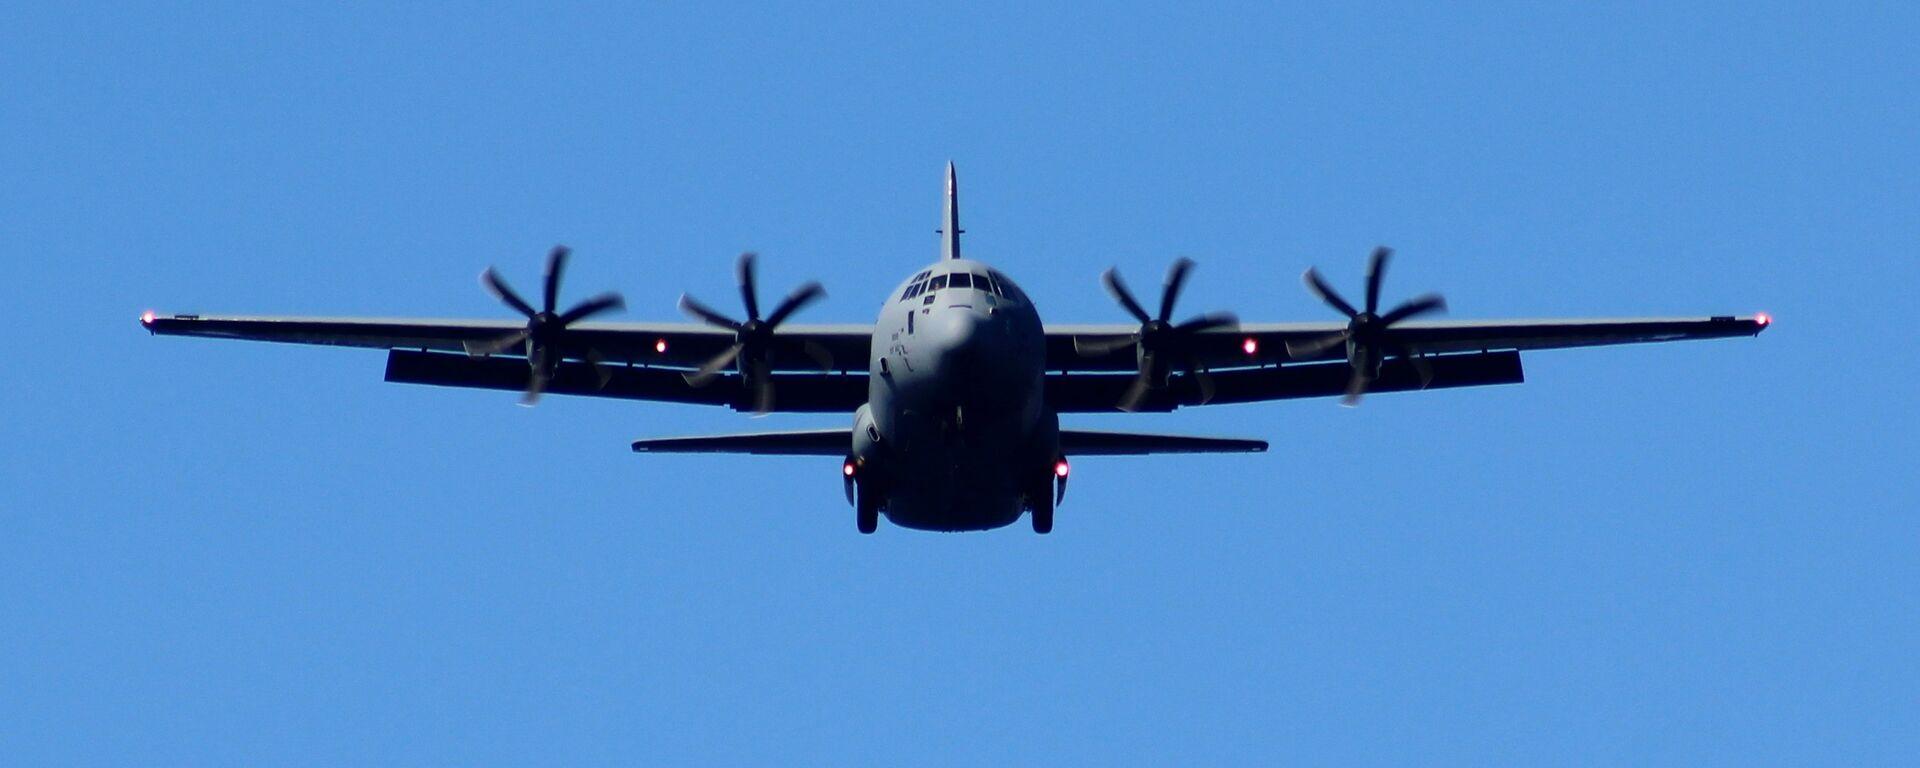 USAF Lockheed C-130J Hercules - Sputnik Mundo, 1920, 09.07.2021